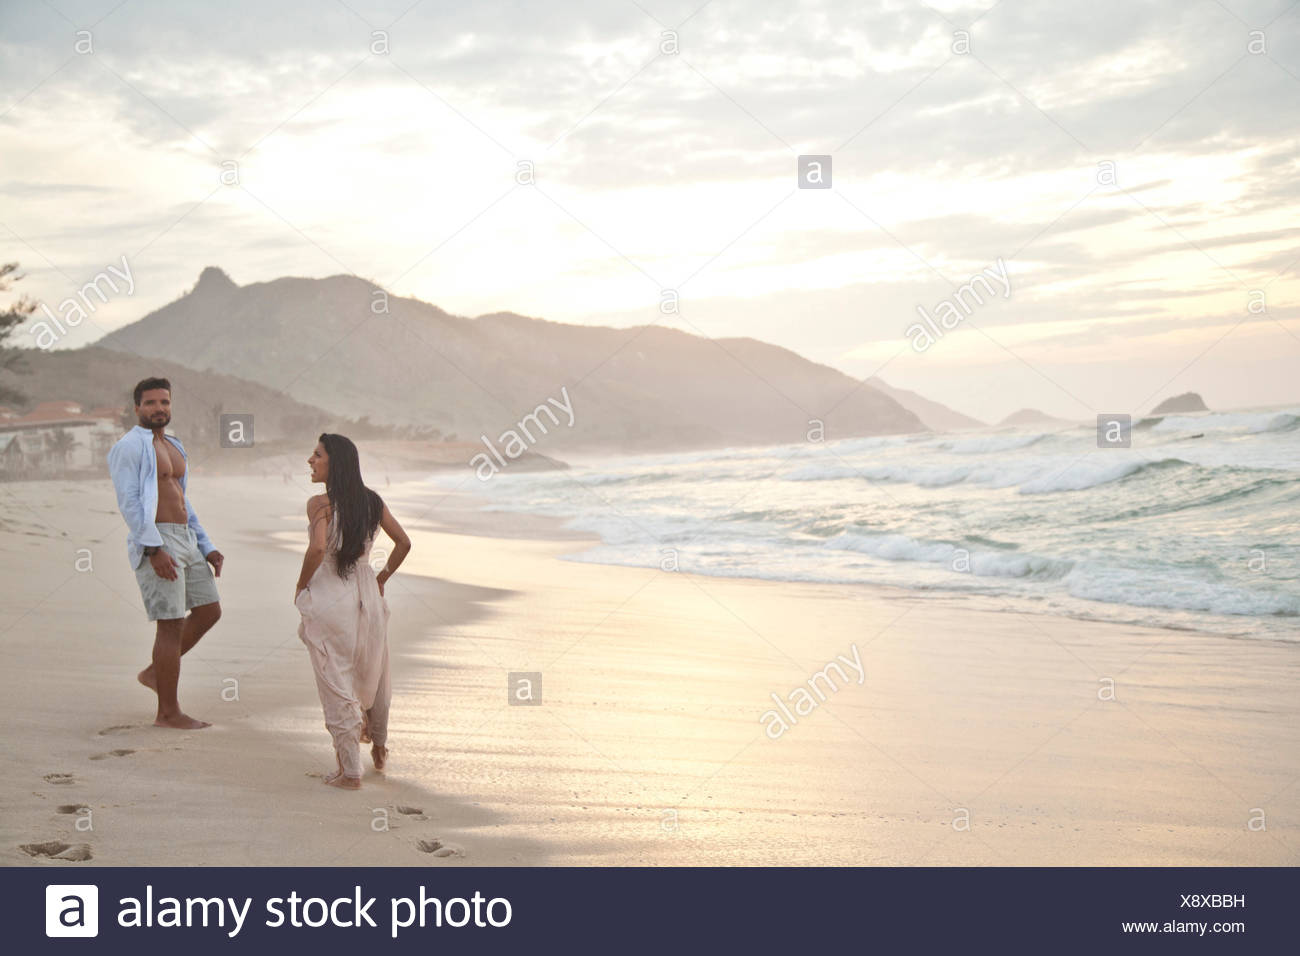 Mitte erwachsenes paar am Strand, Rio De Janeiro, Brasilien Stockbild